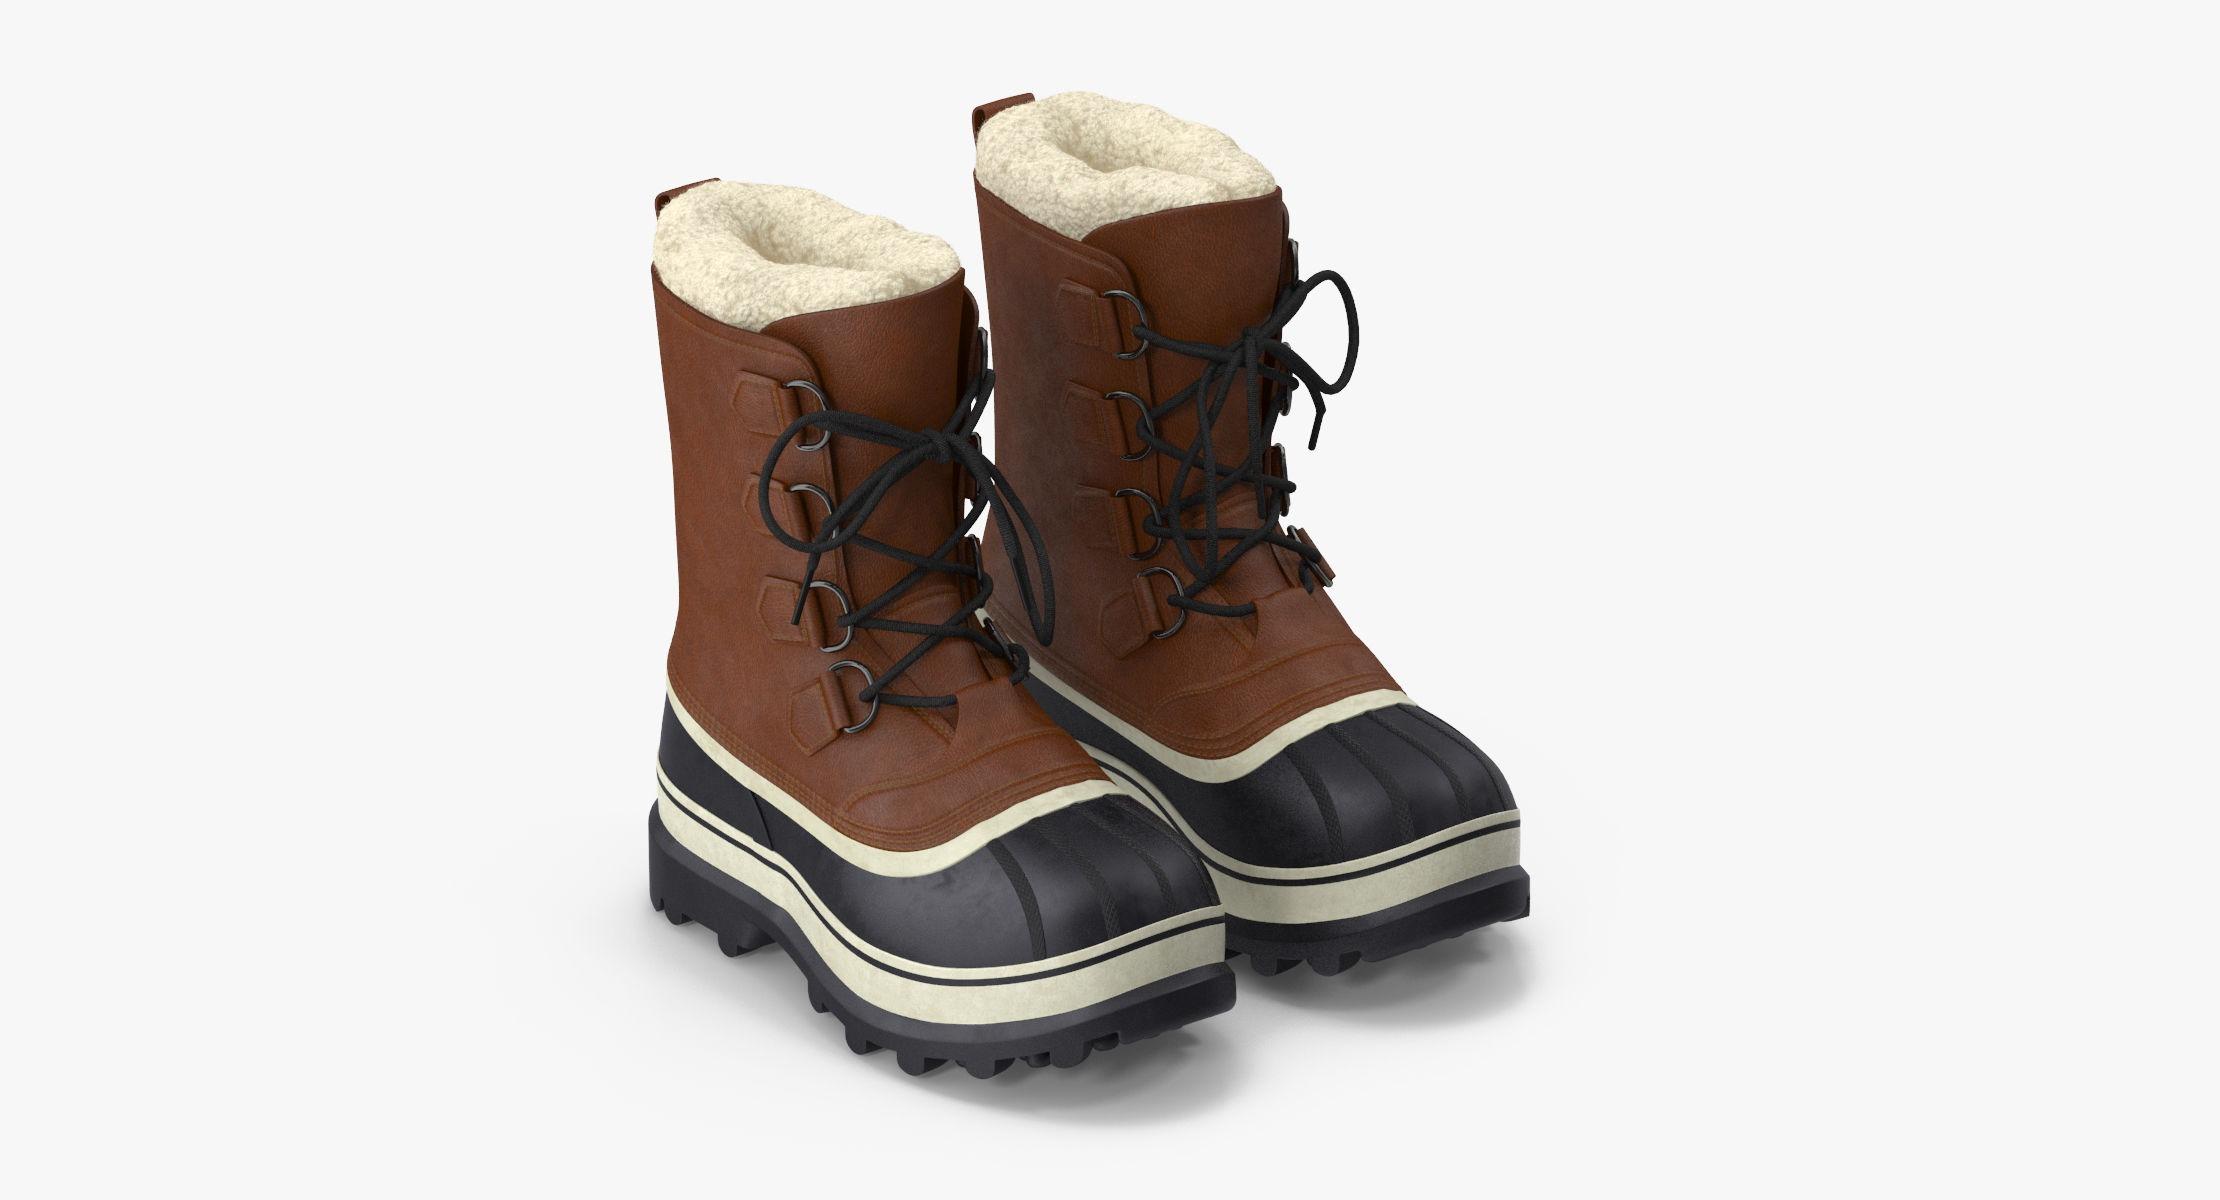 Snow Boots 01 - reel 1